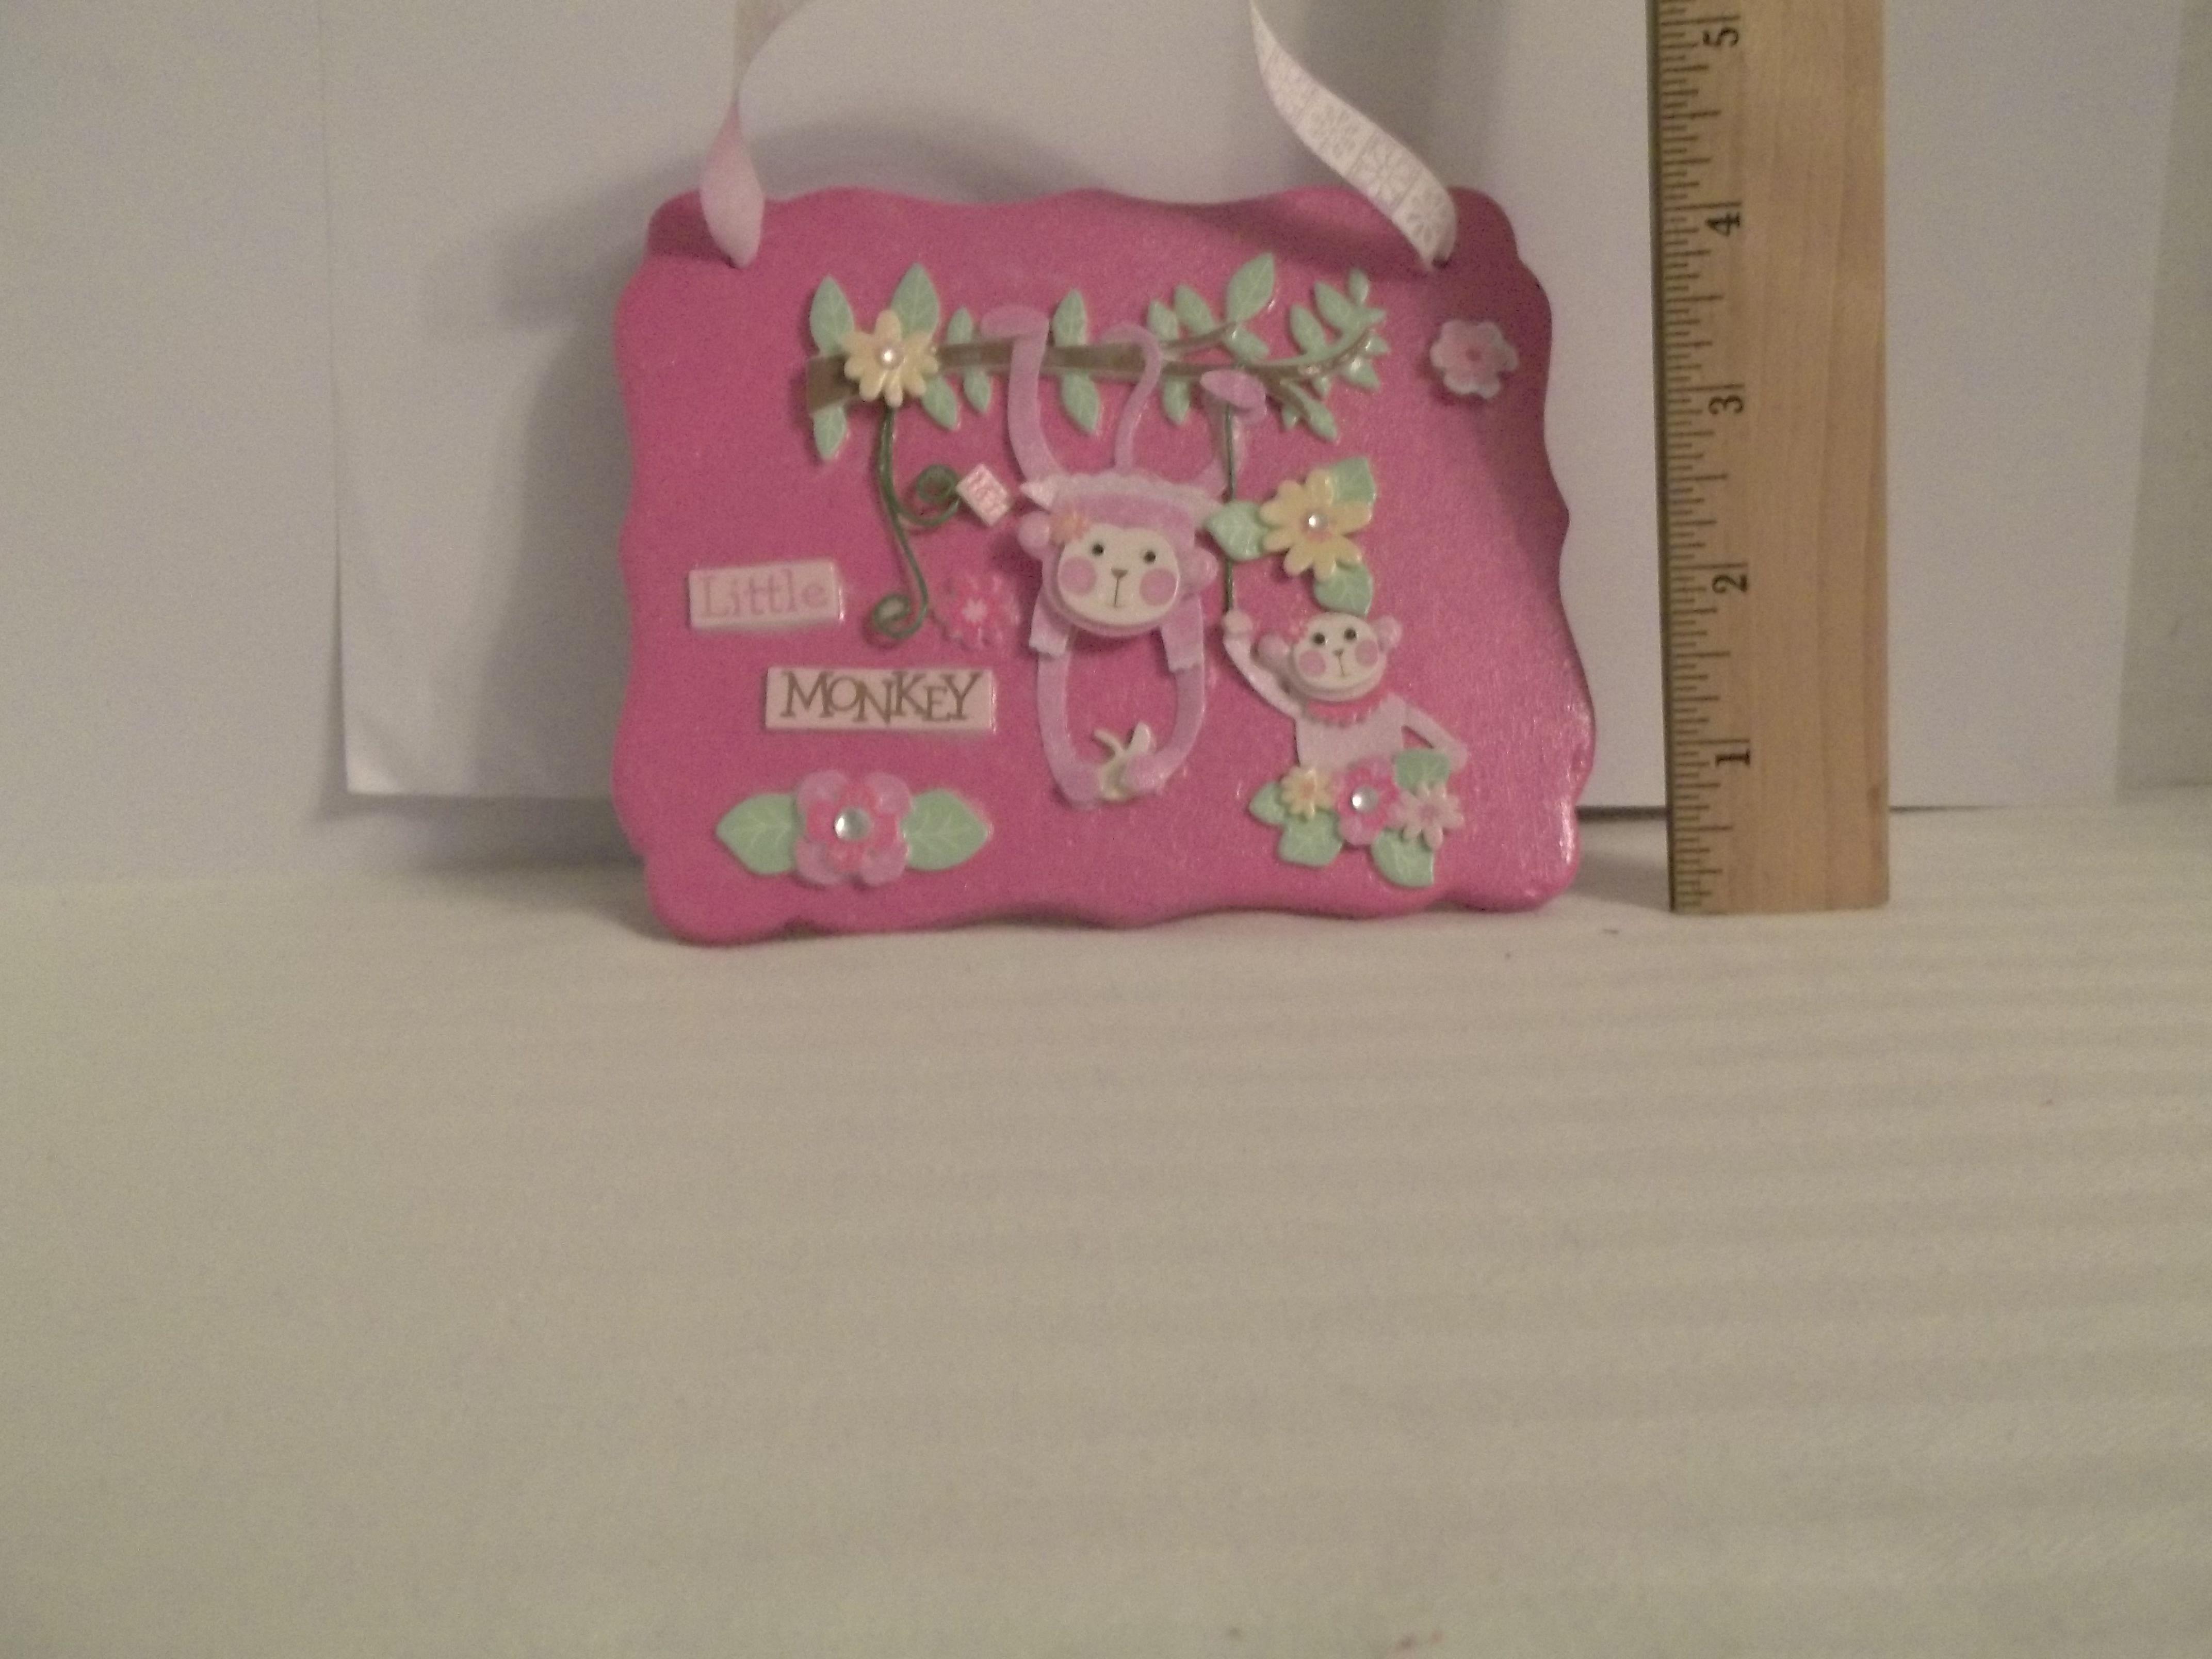 Price 500 pink ceramic tile my little monkey 5x 6plaque price 500 pink ceramic tile my little monkey 5x 6 dailygadgetfo Choice Image